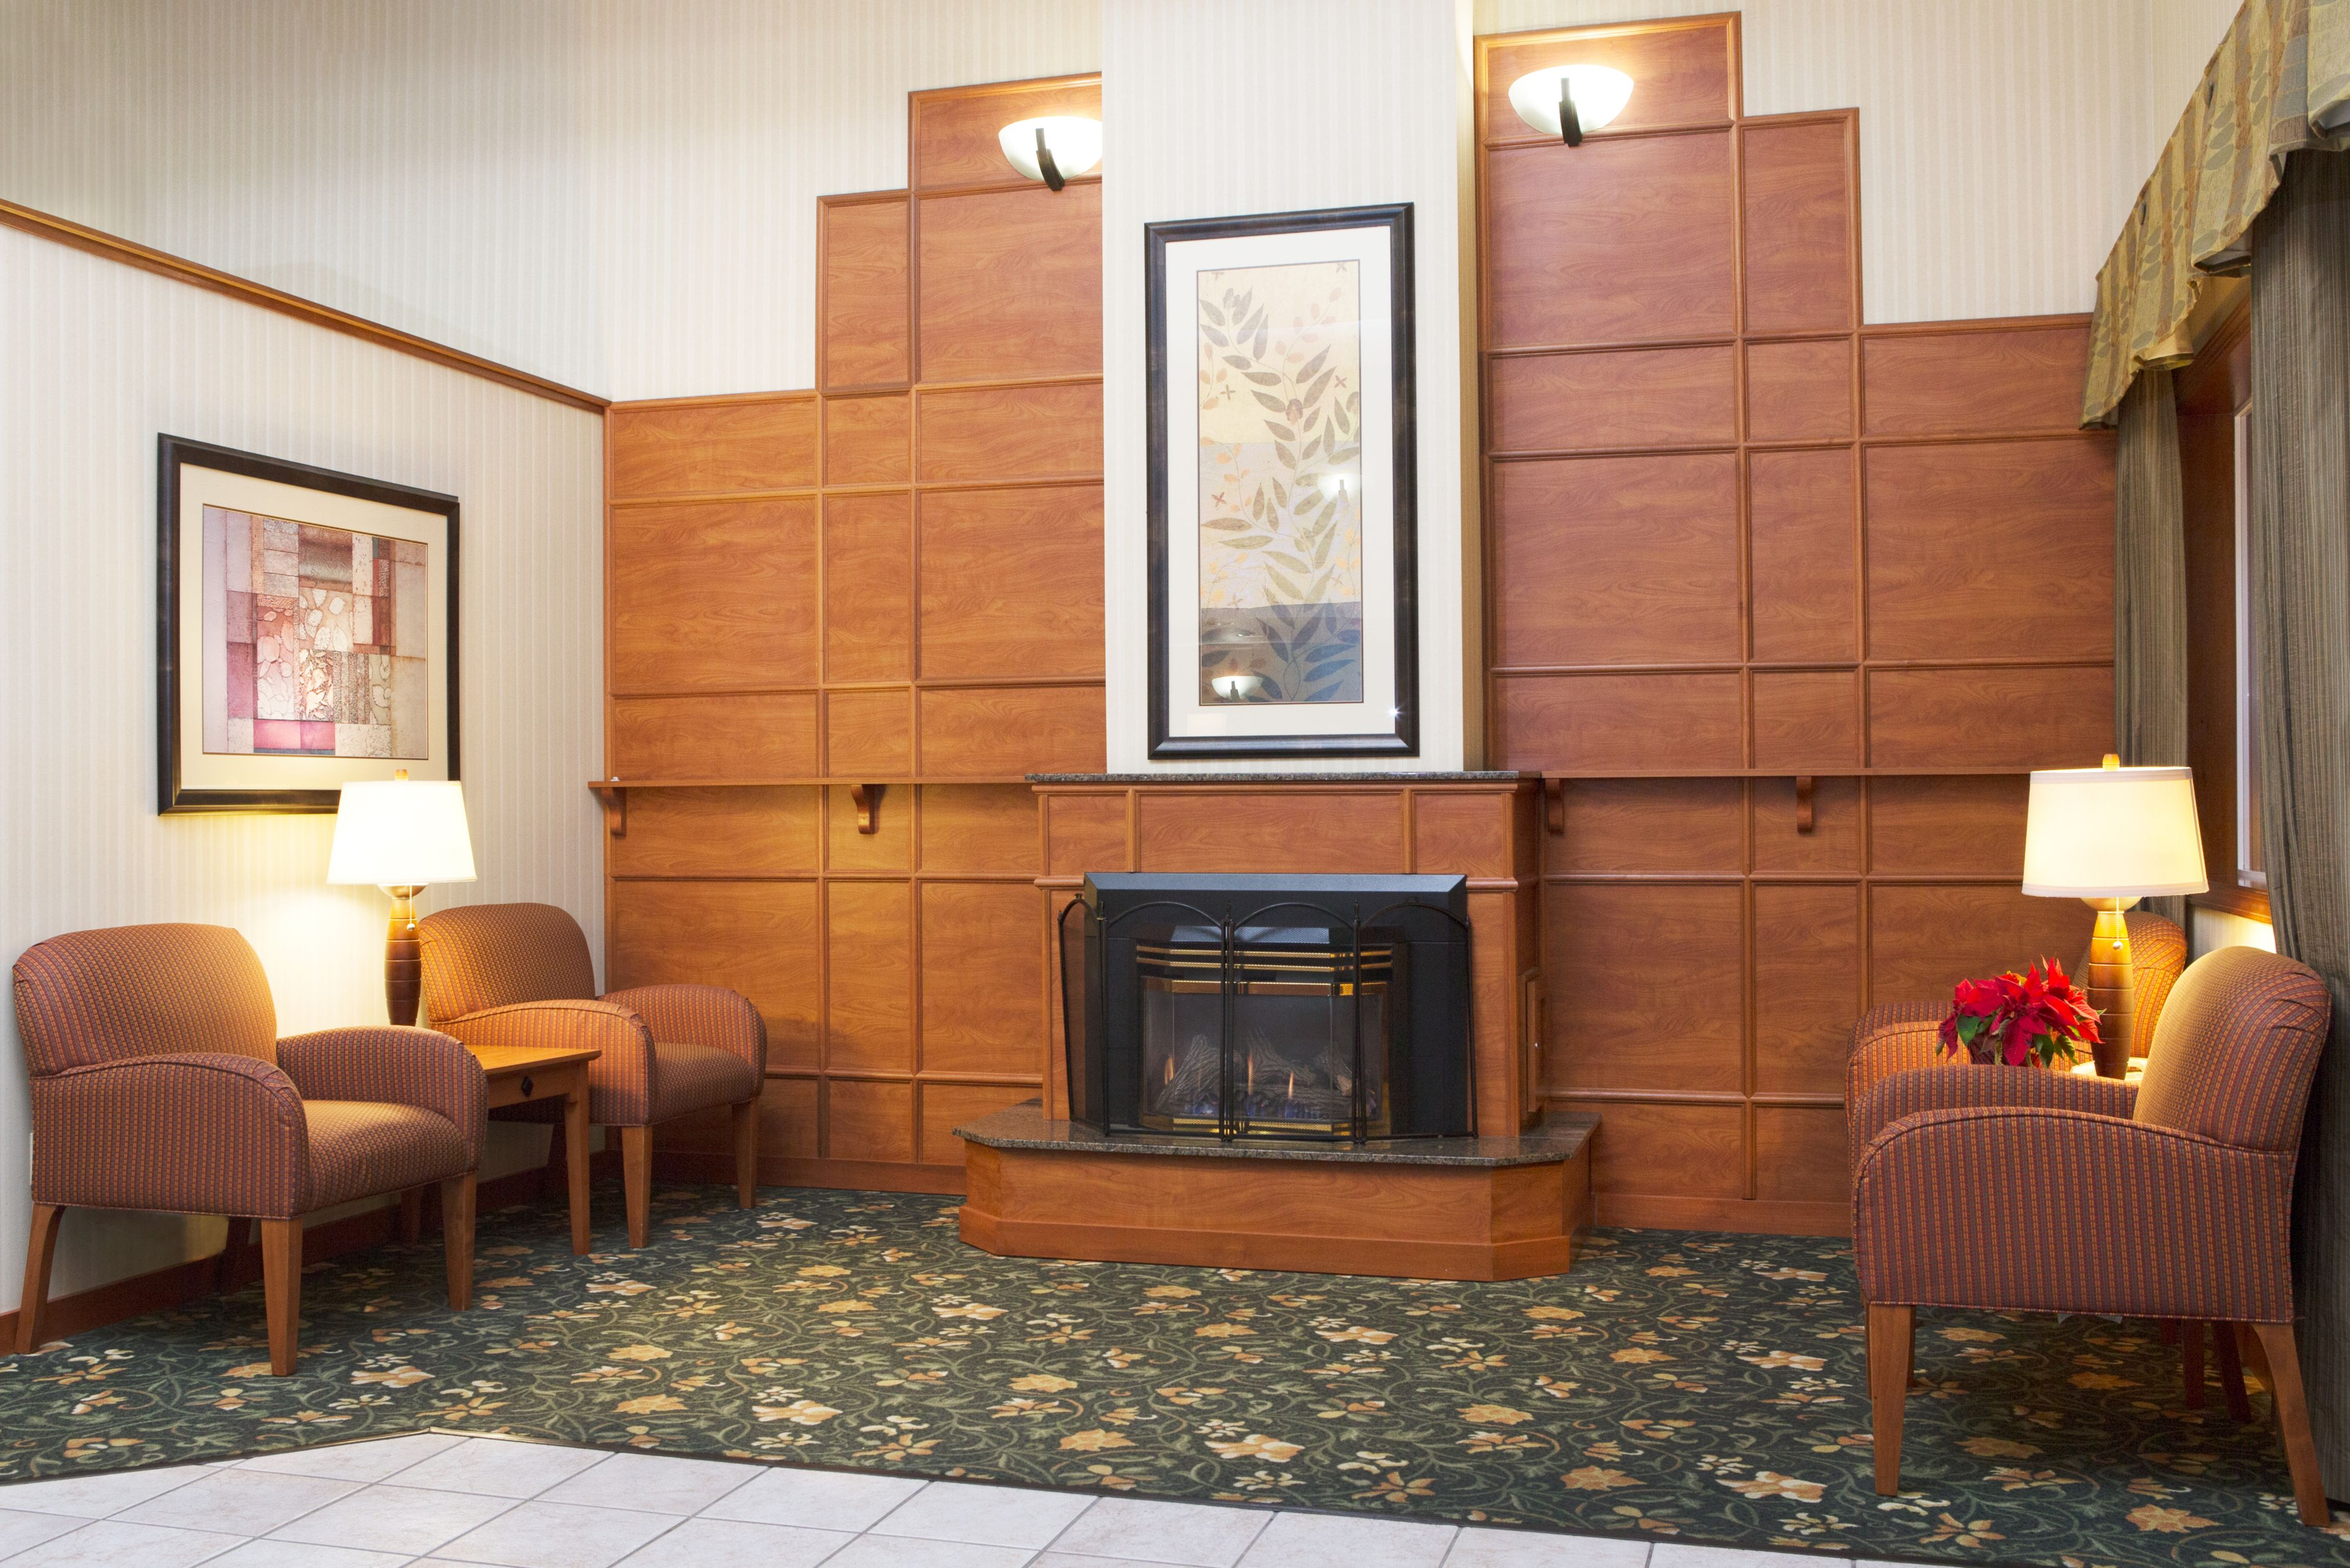 Holiday Inn Express & Suites Burlington image 5